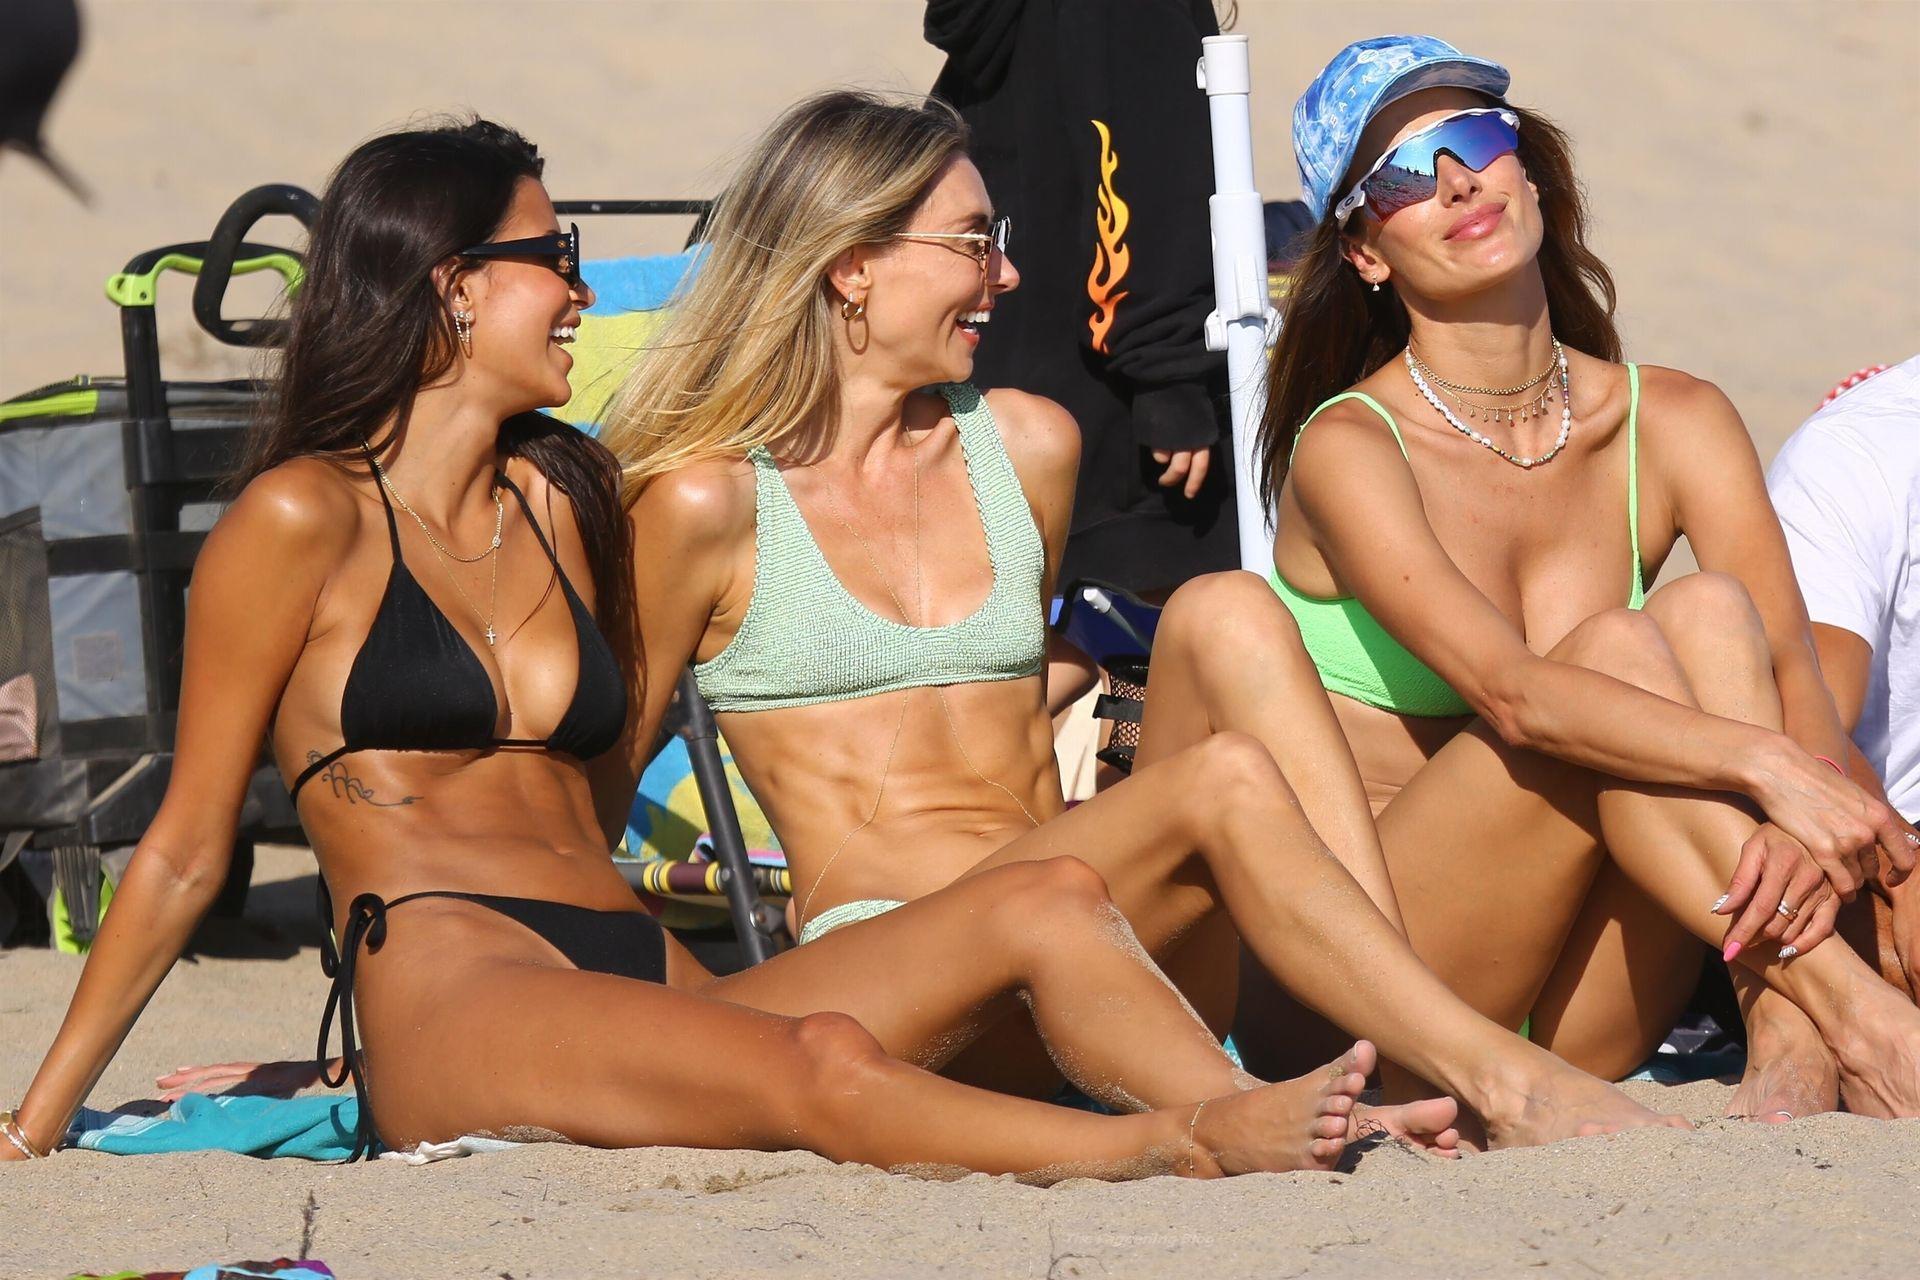 Alessandra-Ambrosio-Sexy-The-Fappening-Blog-821.jpg